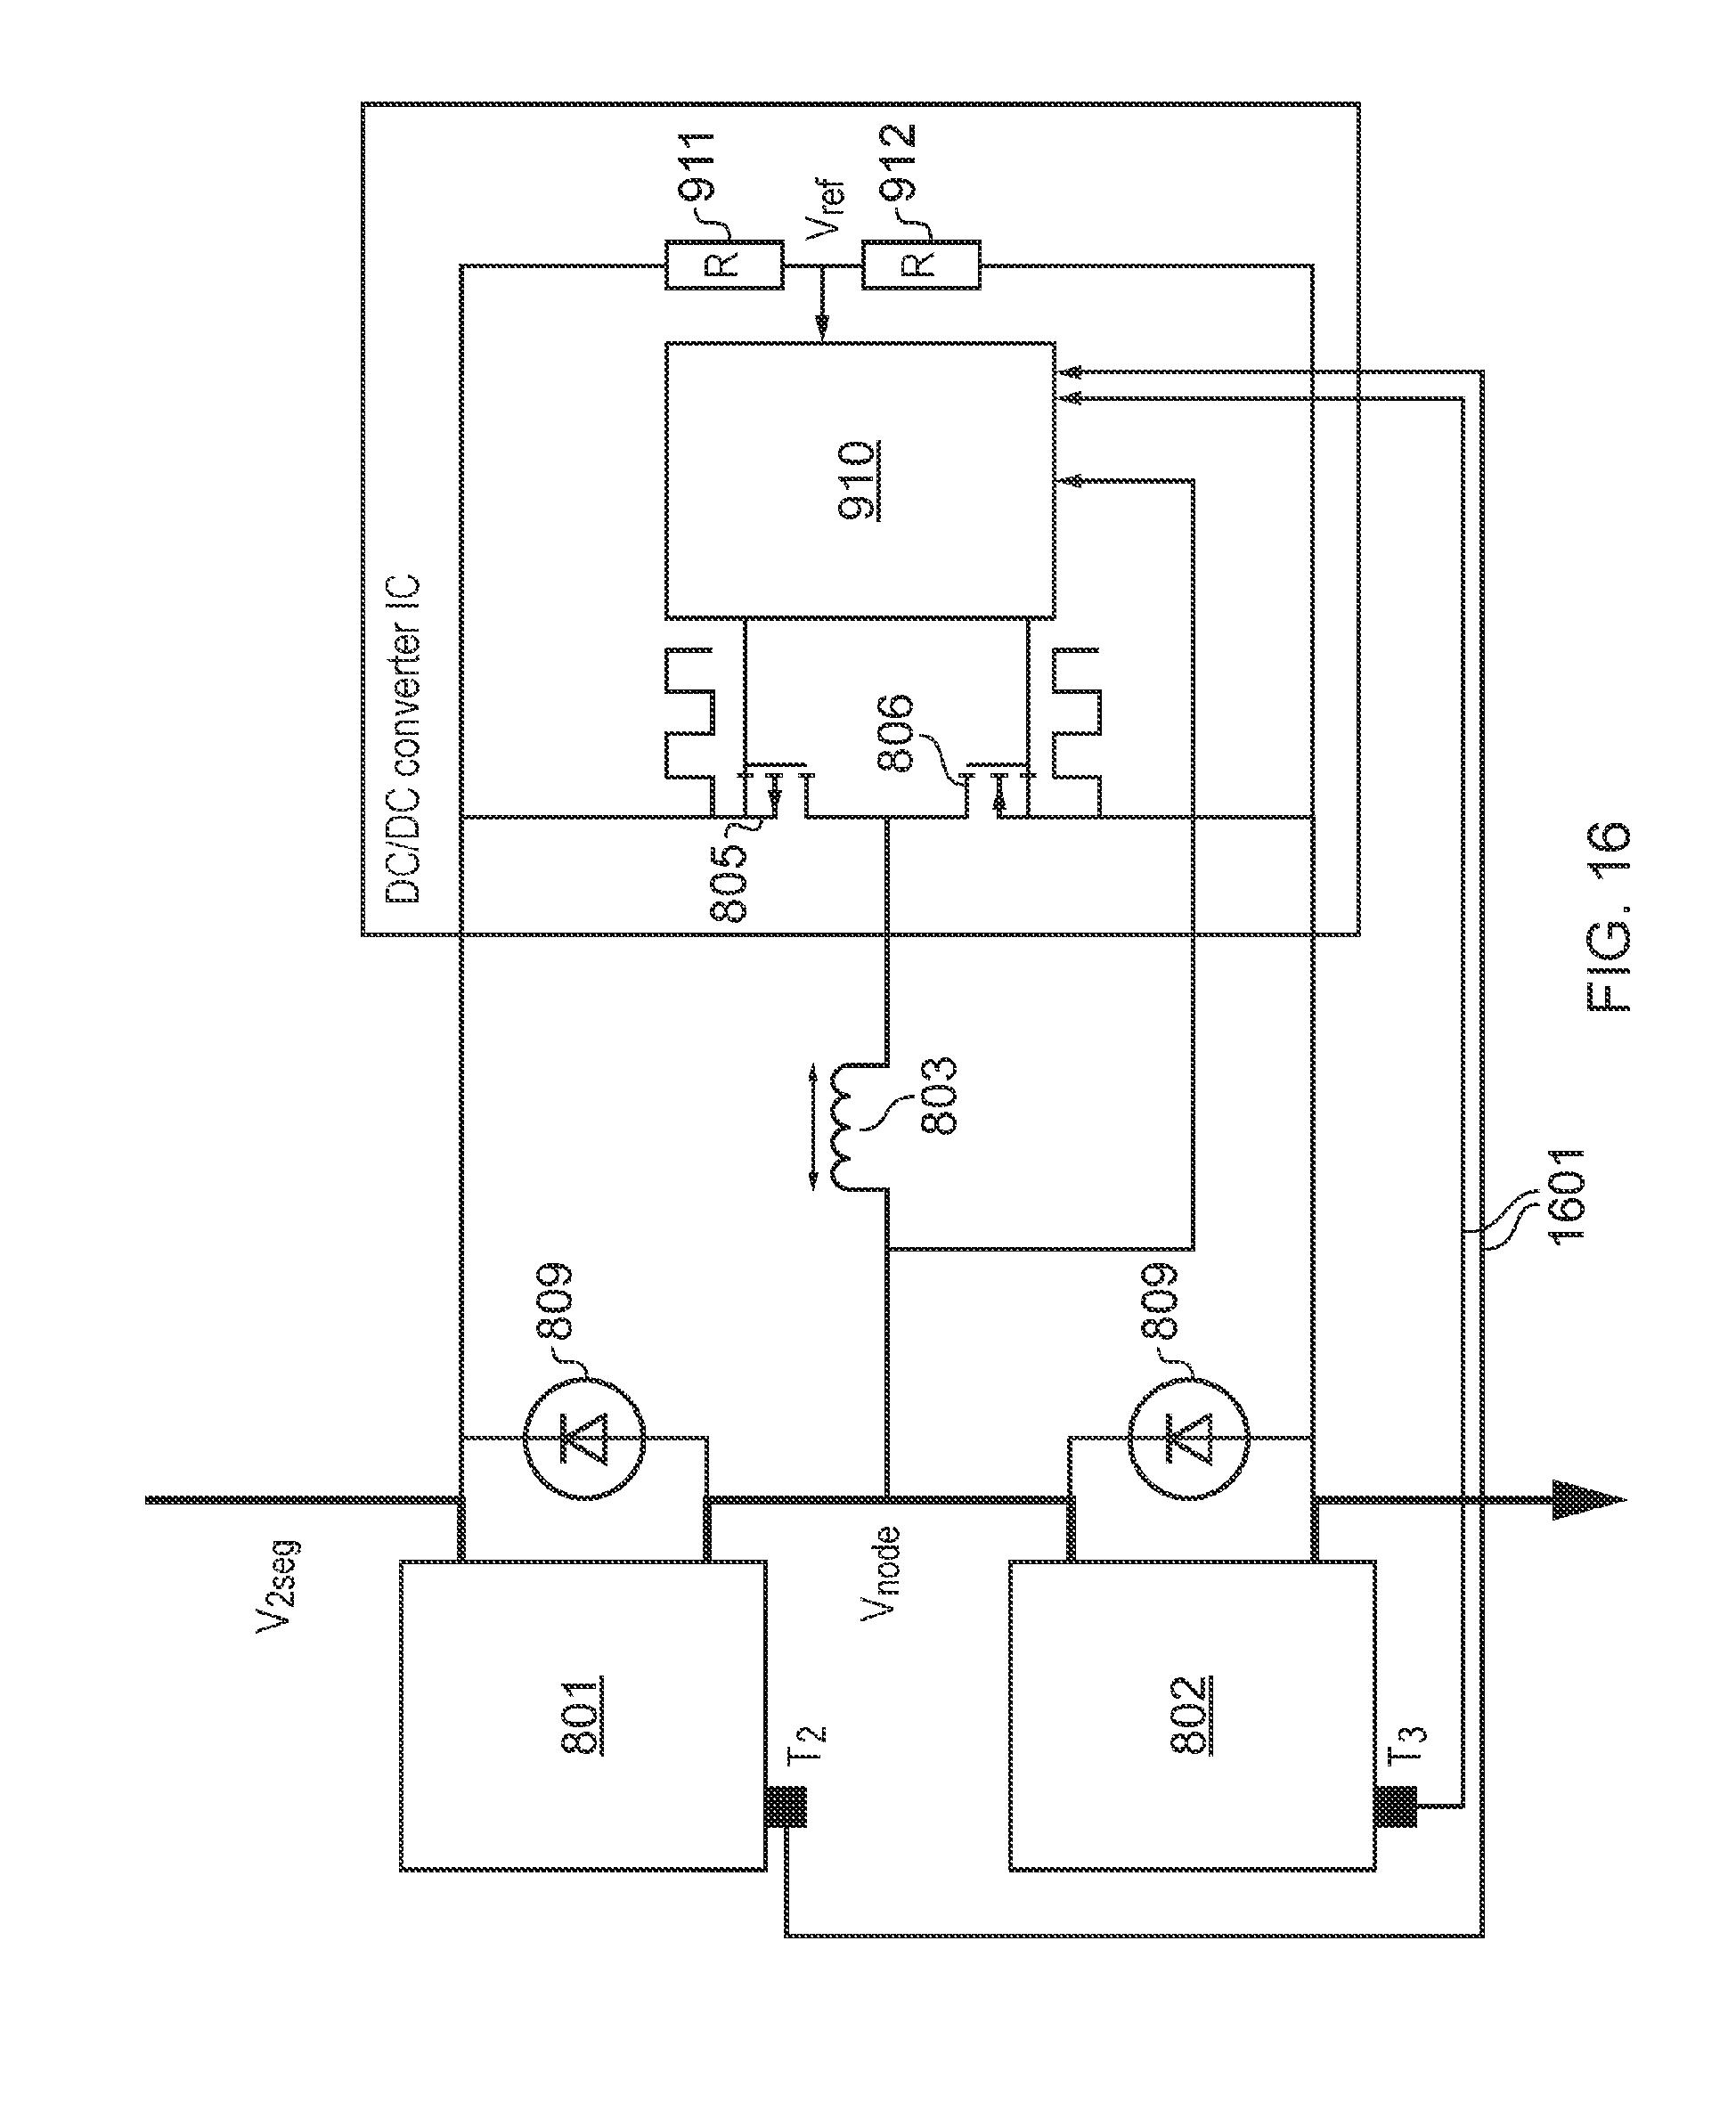 battery isolator wiring diagram triumph tr6 sure power